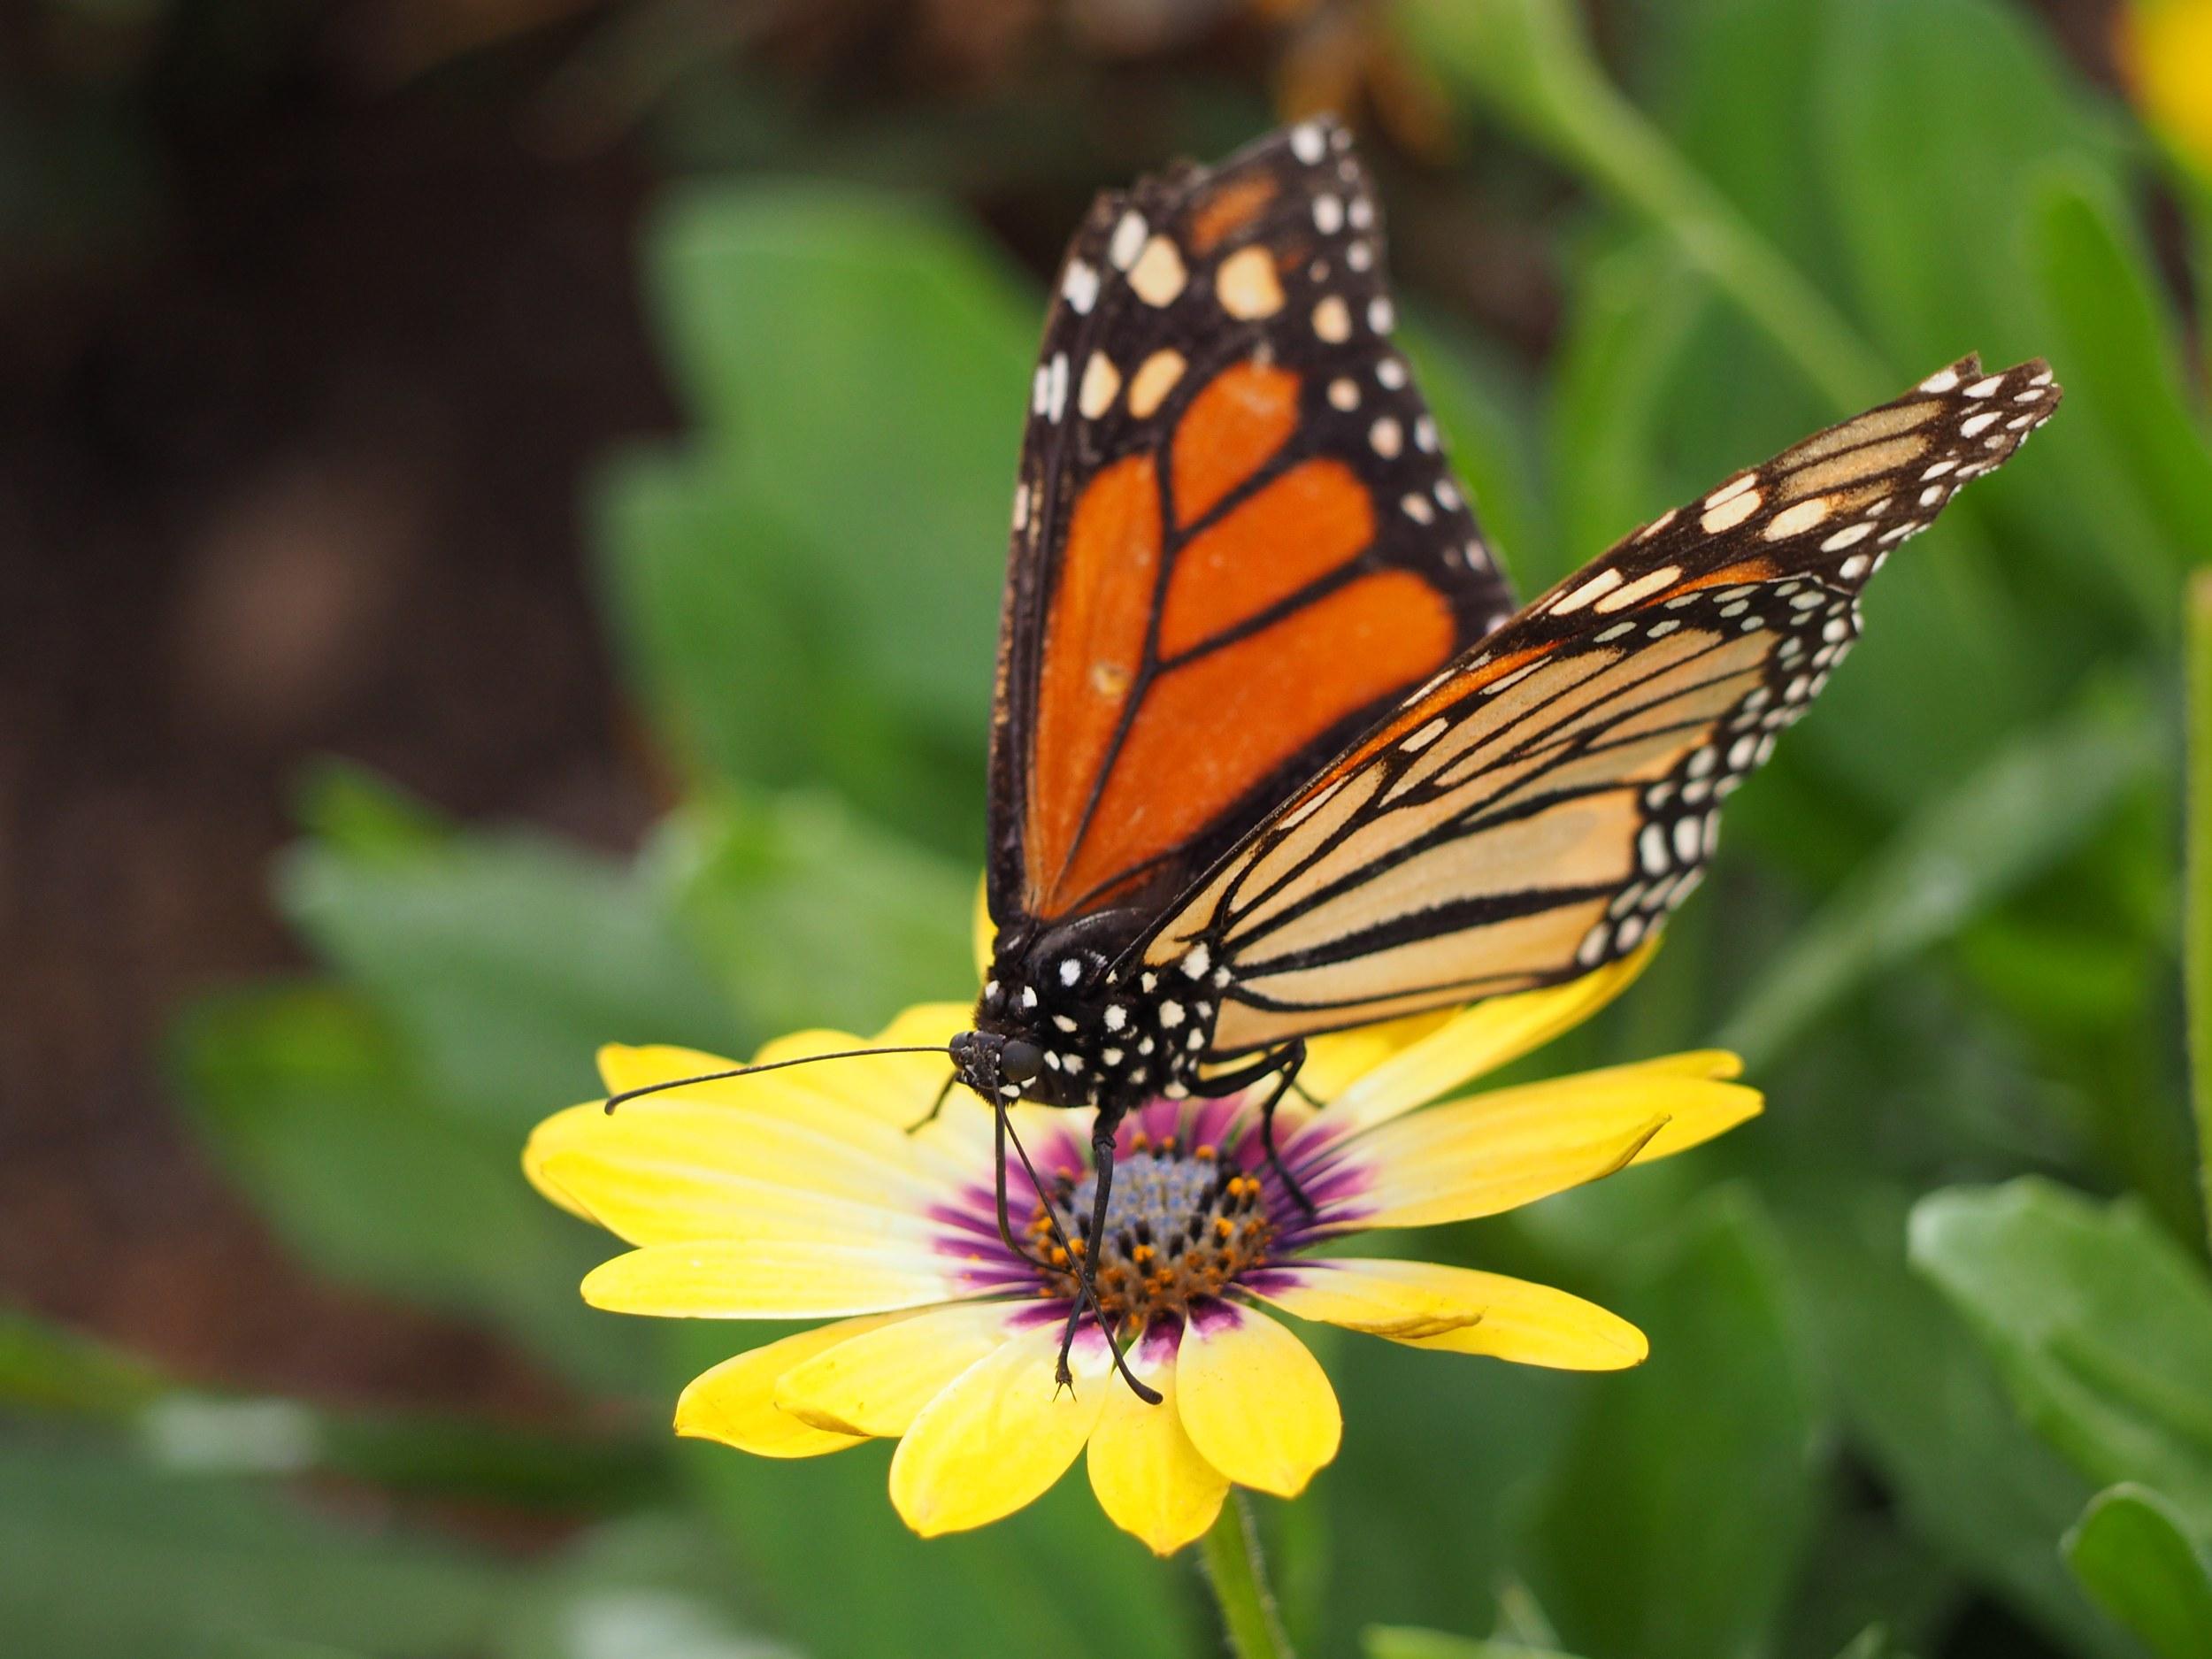 Butterfly in the Sonoran Desert